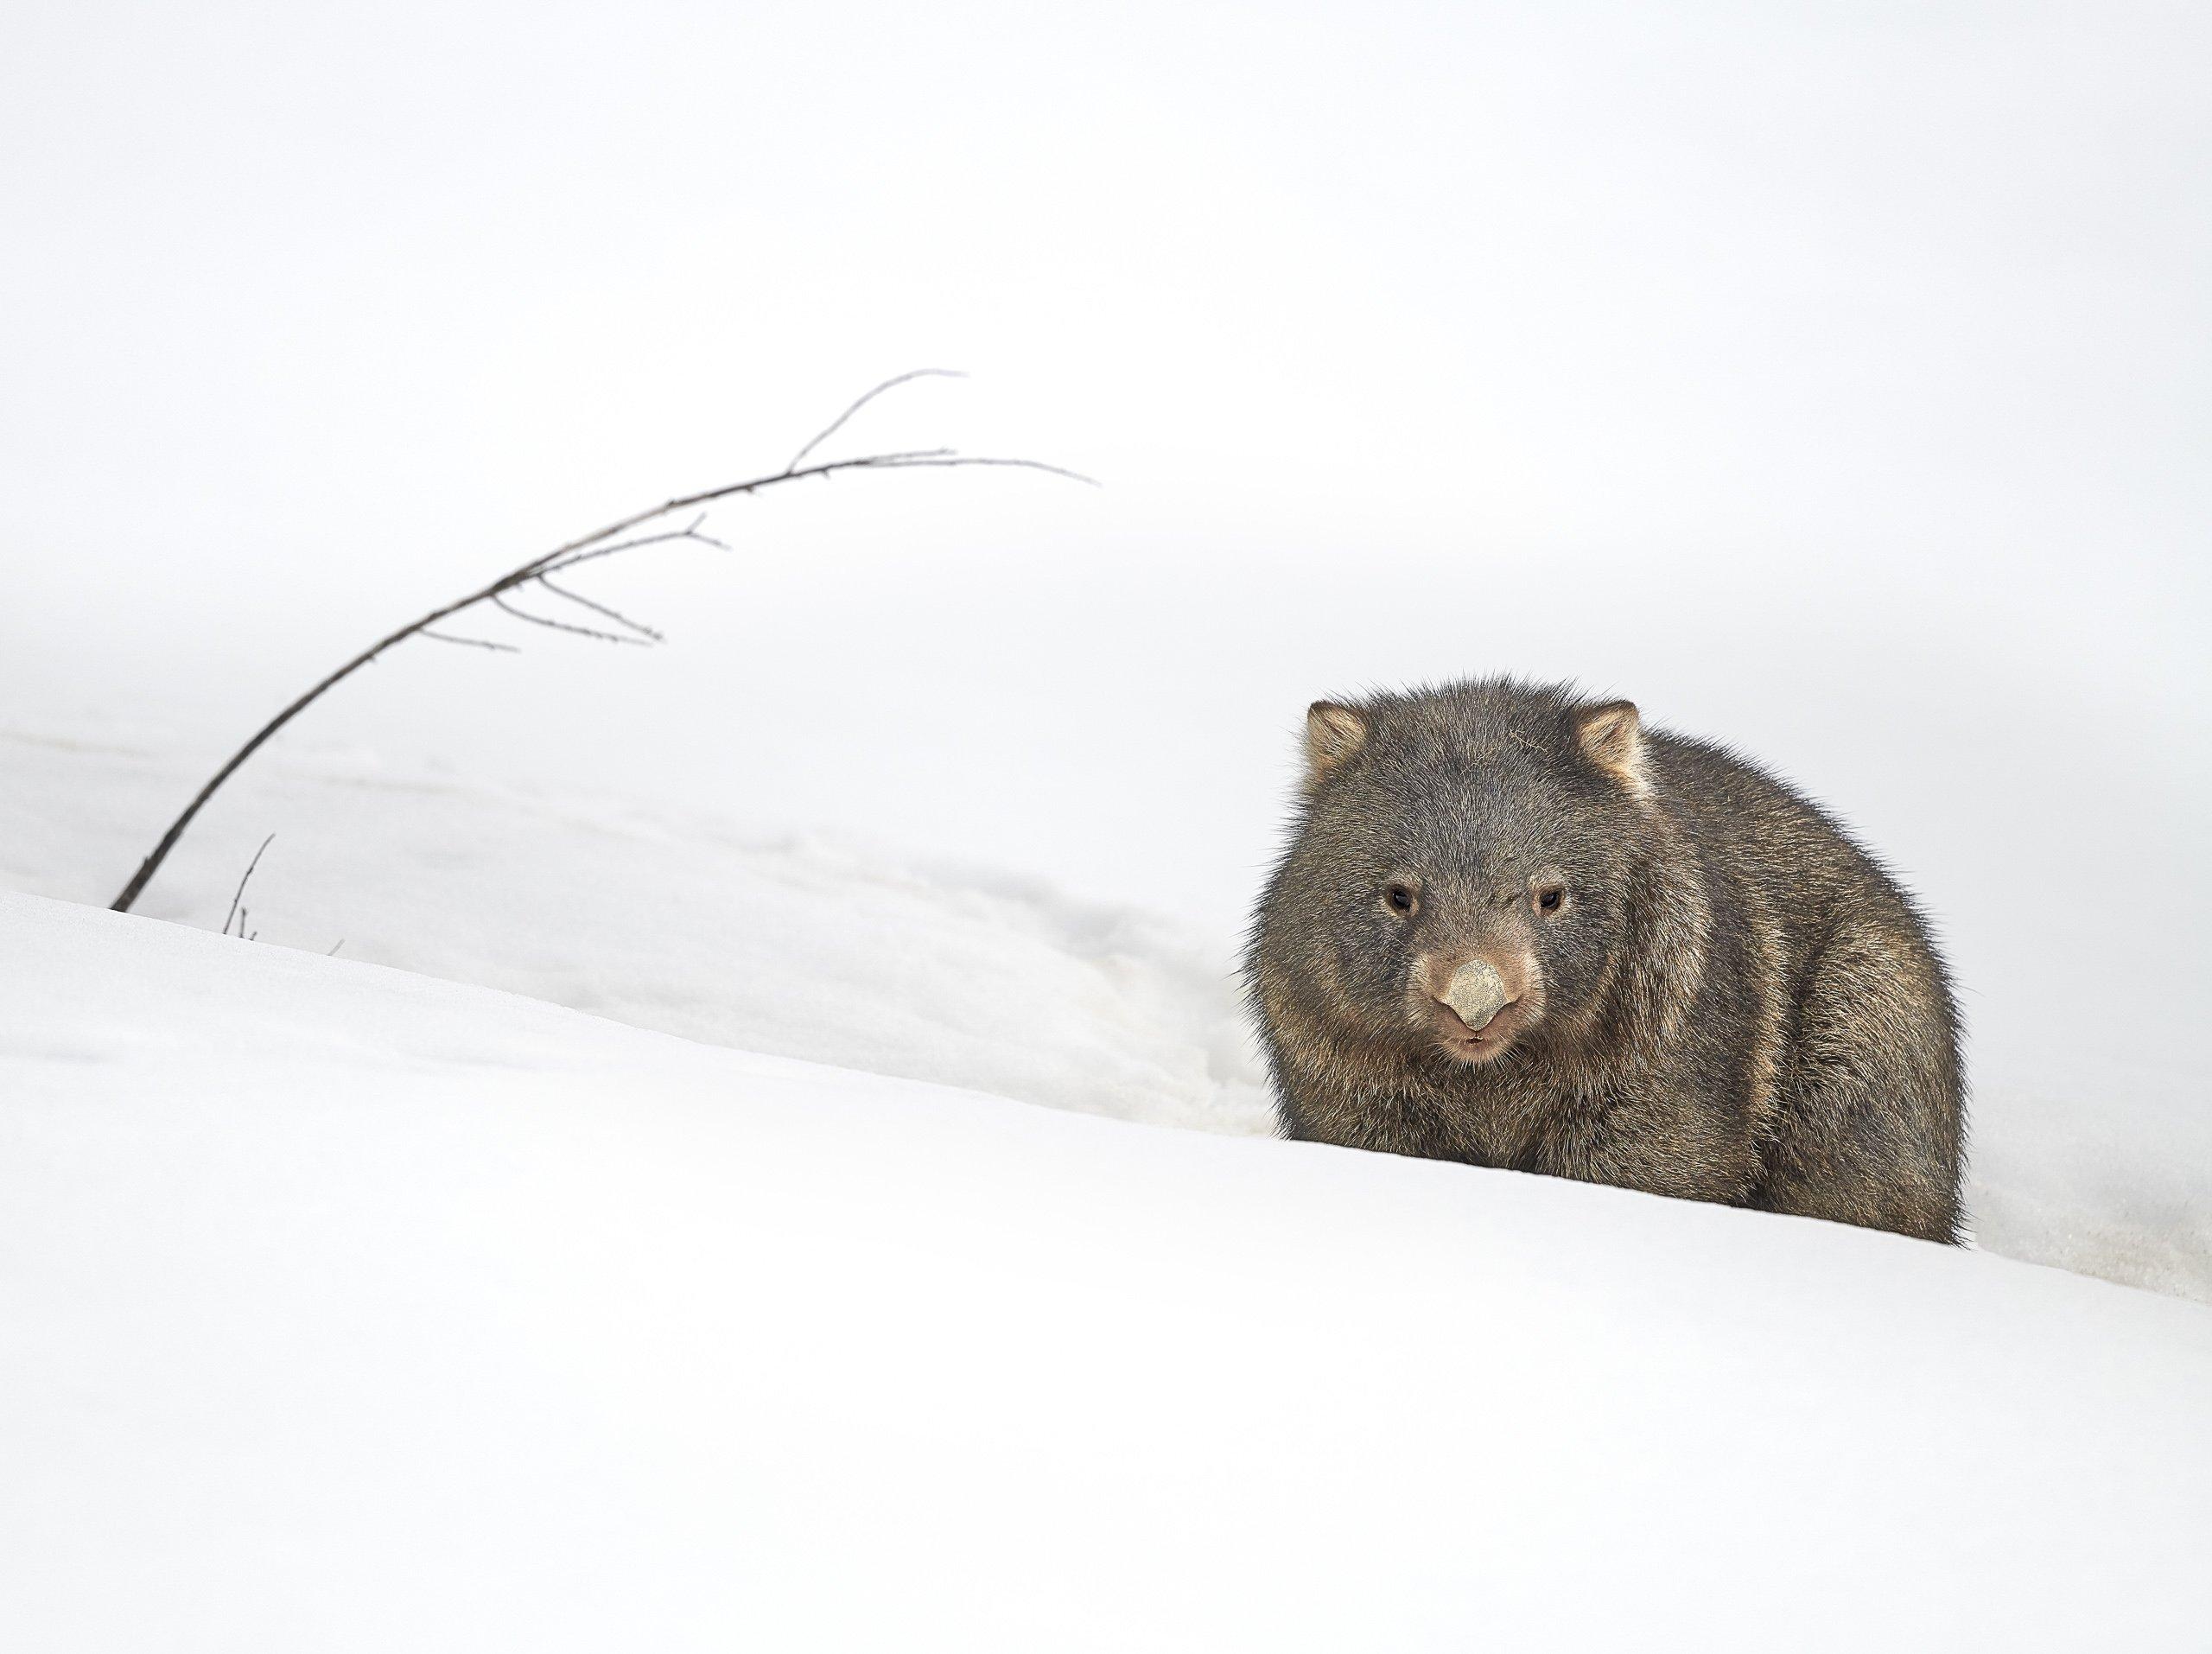 Matilda the wombat in snow, Koscuiszko National Park, NSW, Australia.